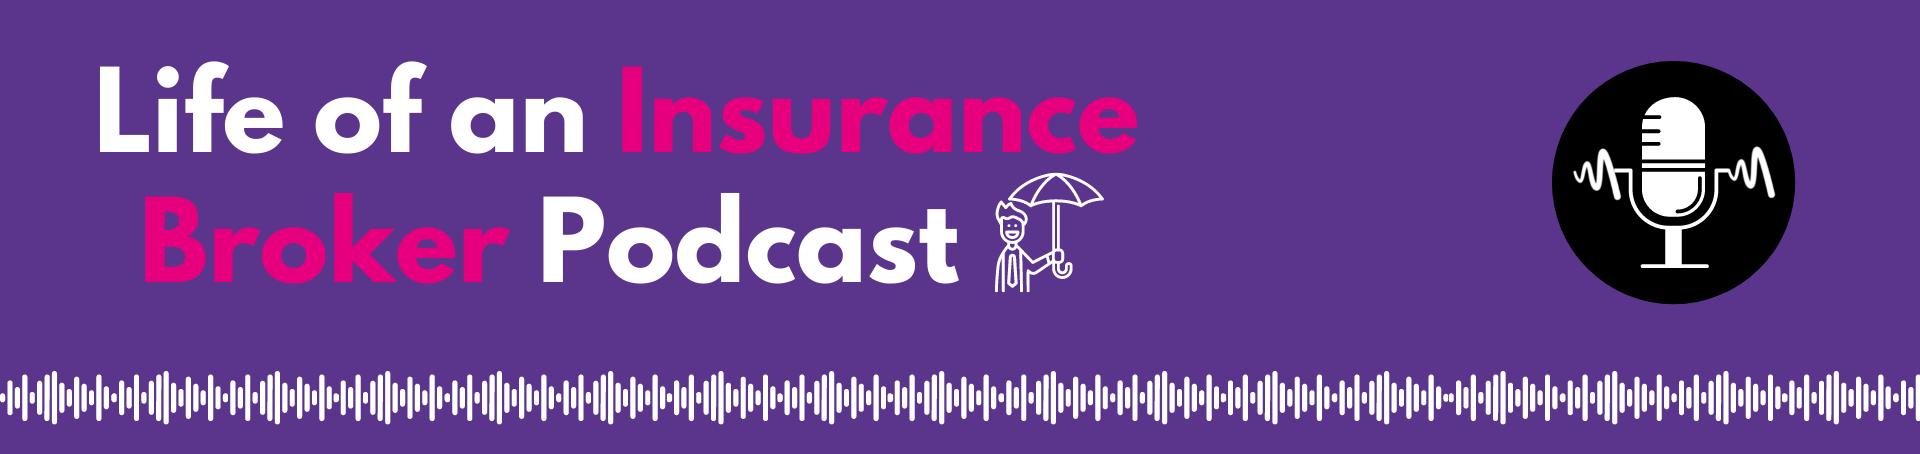 V2 Life of an Insurance Broker Podcast Copy for Website